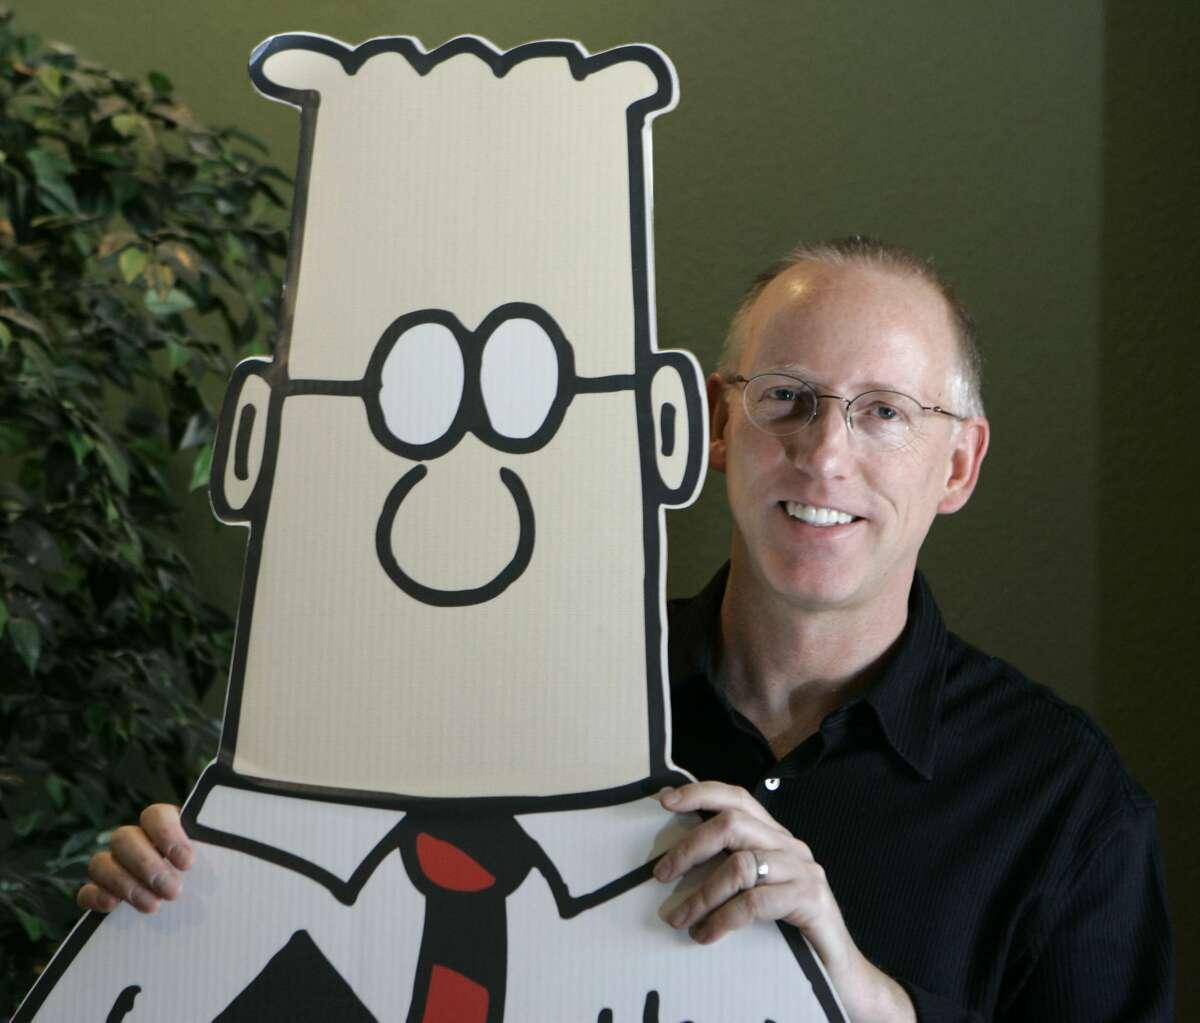 Scott Adams, creator of the comic strip Dilbert, in 2006.